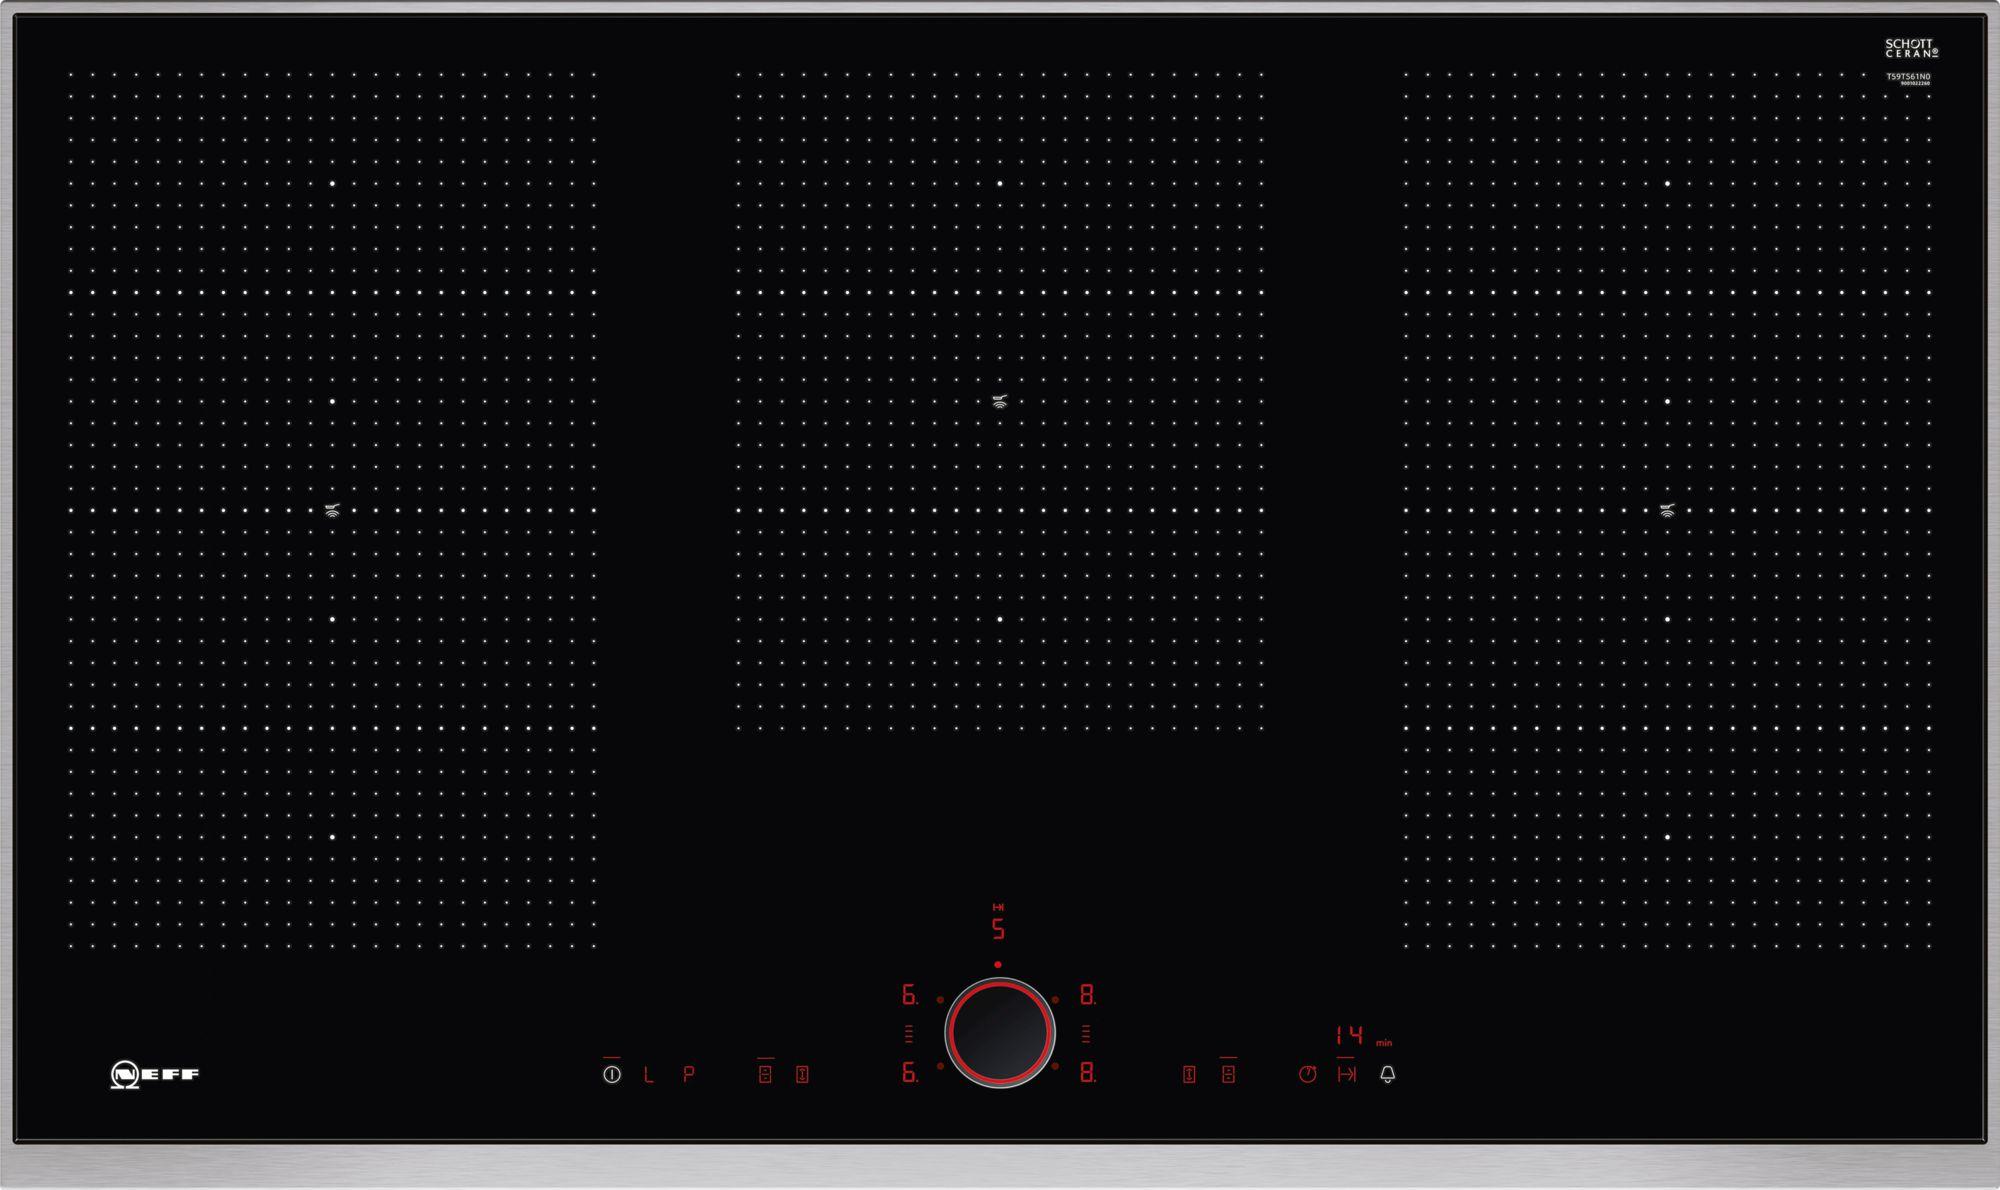 neff t59ts61n0 induction hob discount appliance centre. Black Bedroom Furniture Sets. Home Design Ideas